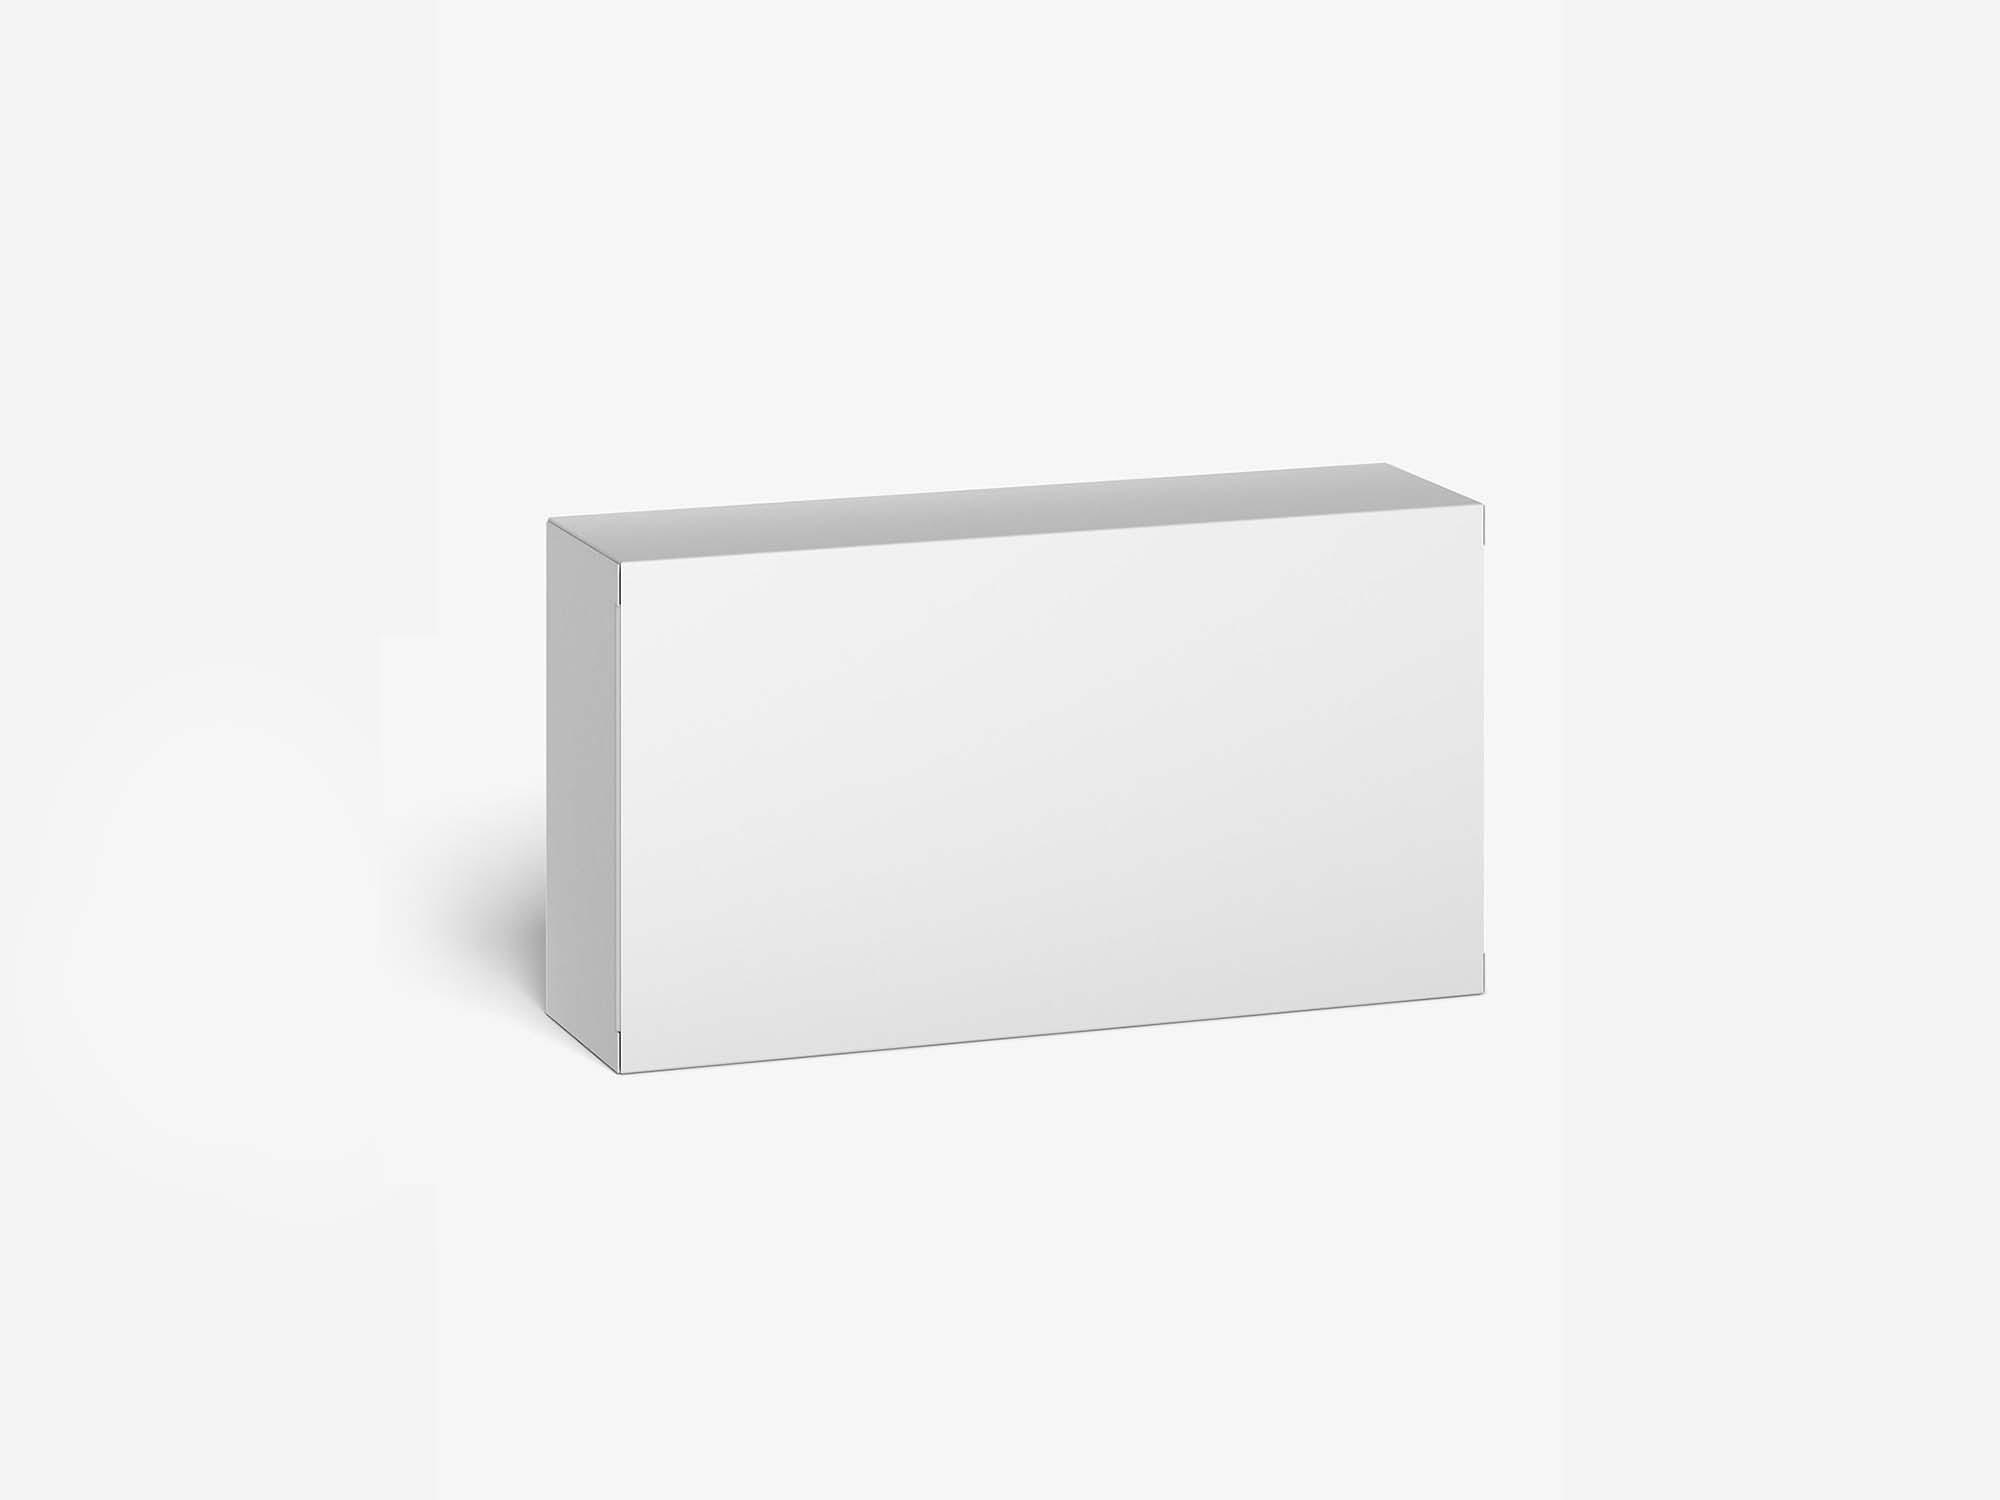 Cardboard Box Mockup 3